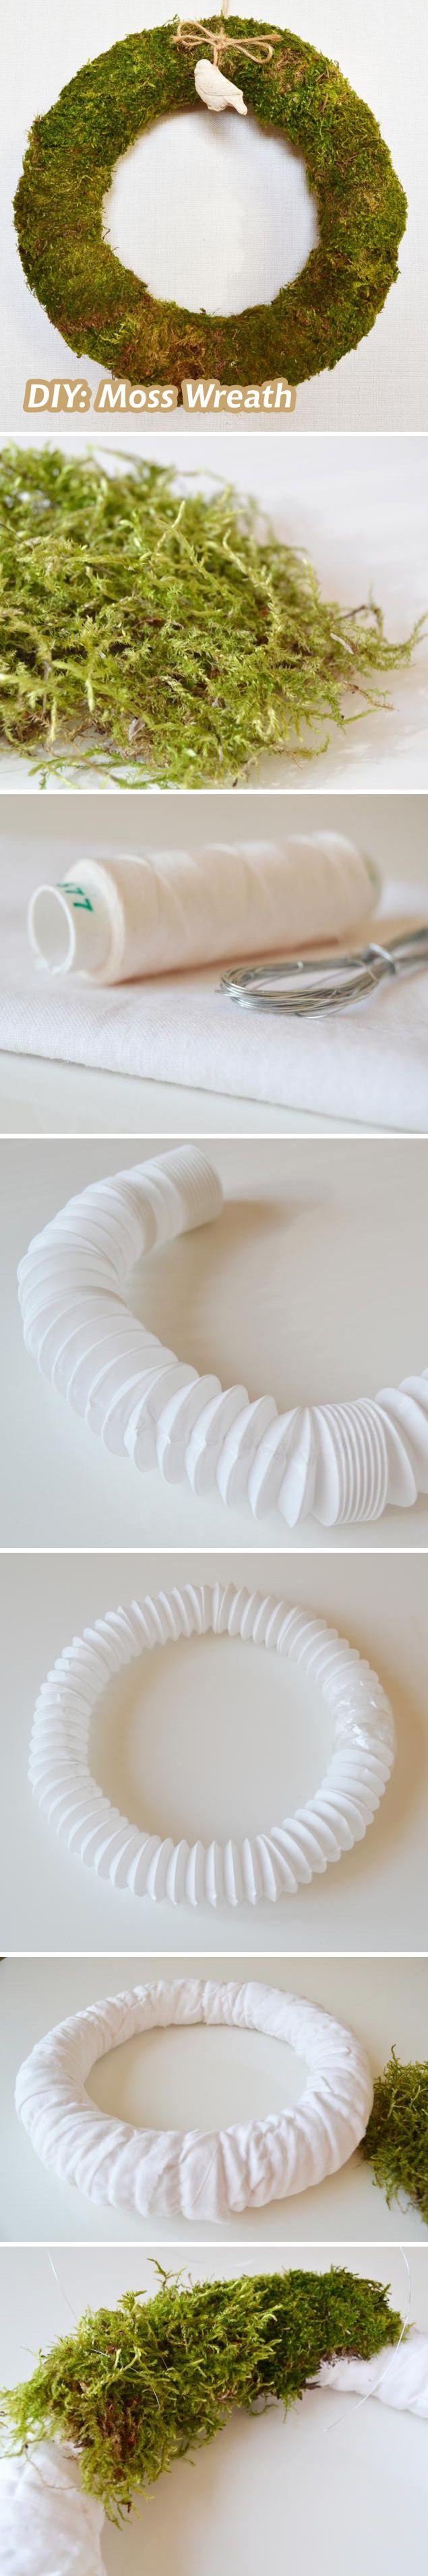 DIY: Moss Wreath   Делаем венок из мха: http://www.livemaster.ru/topic/706515